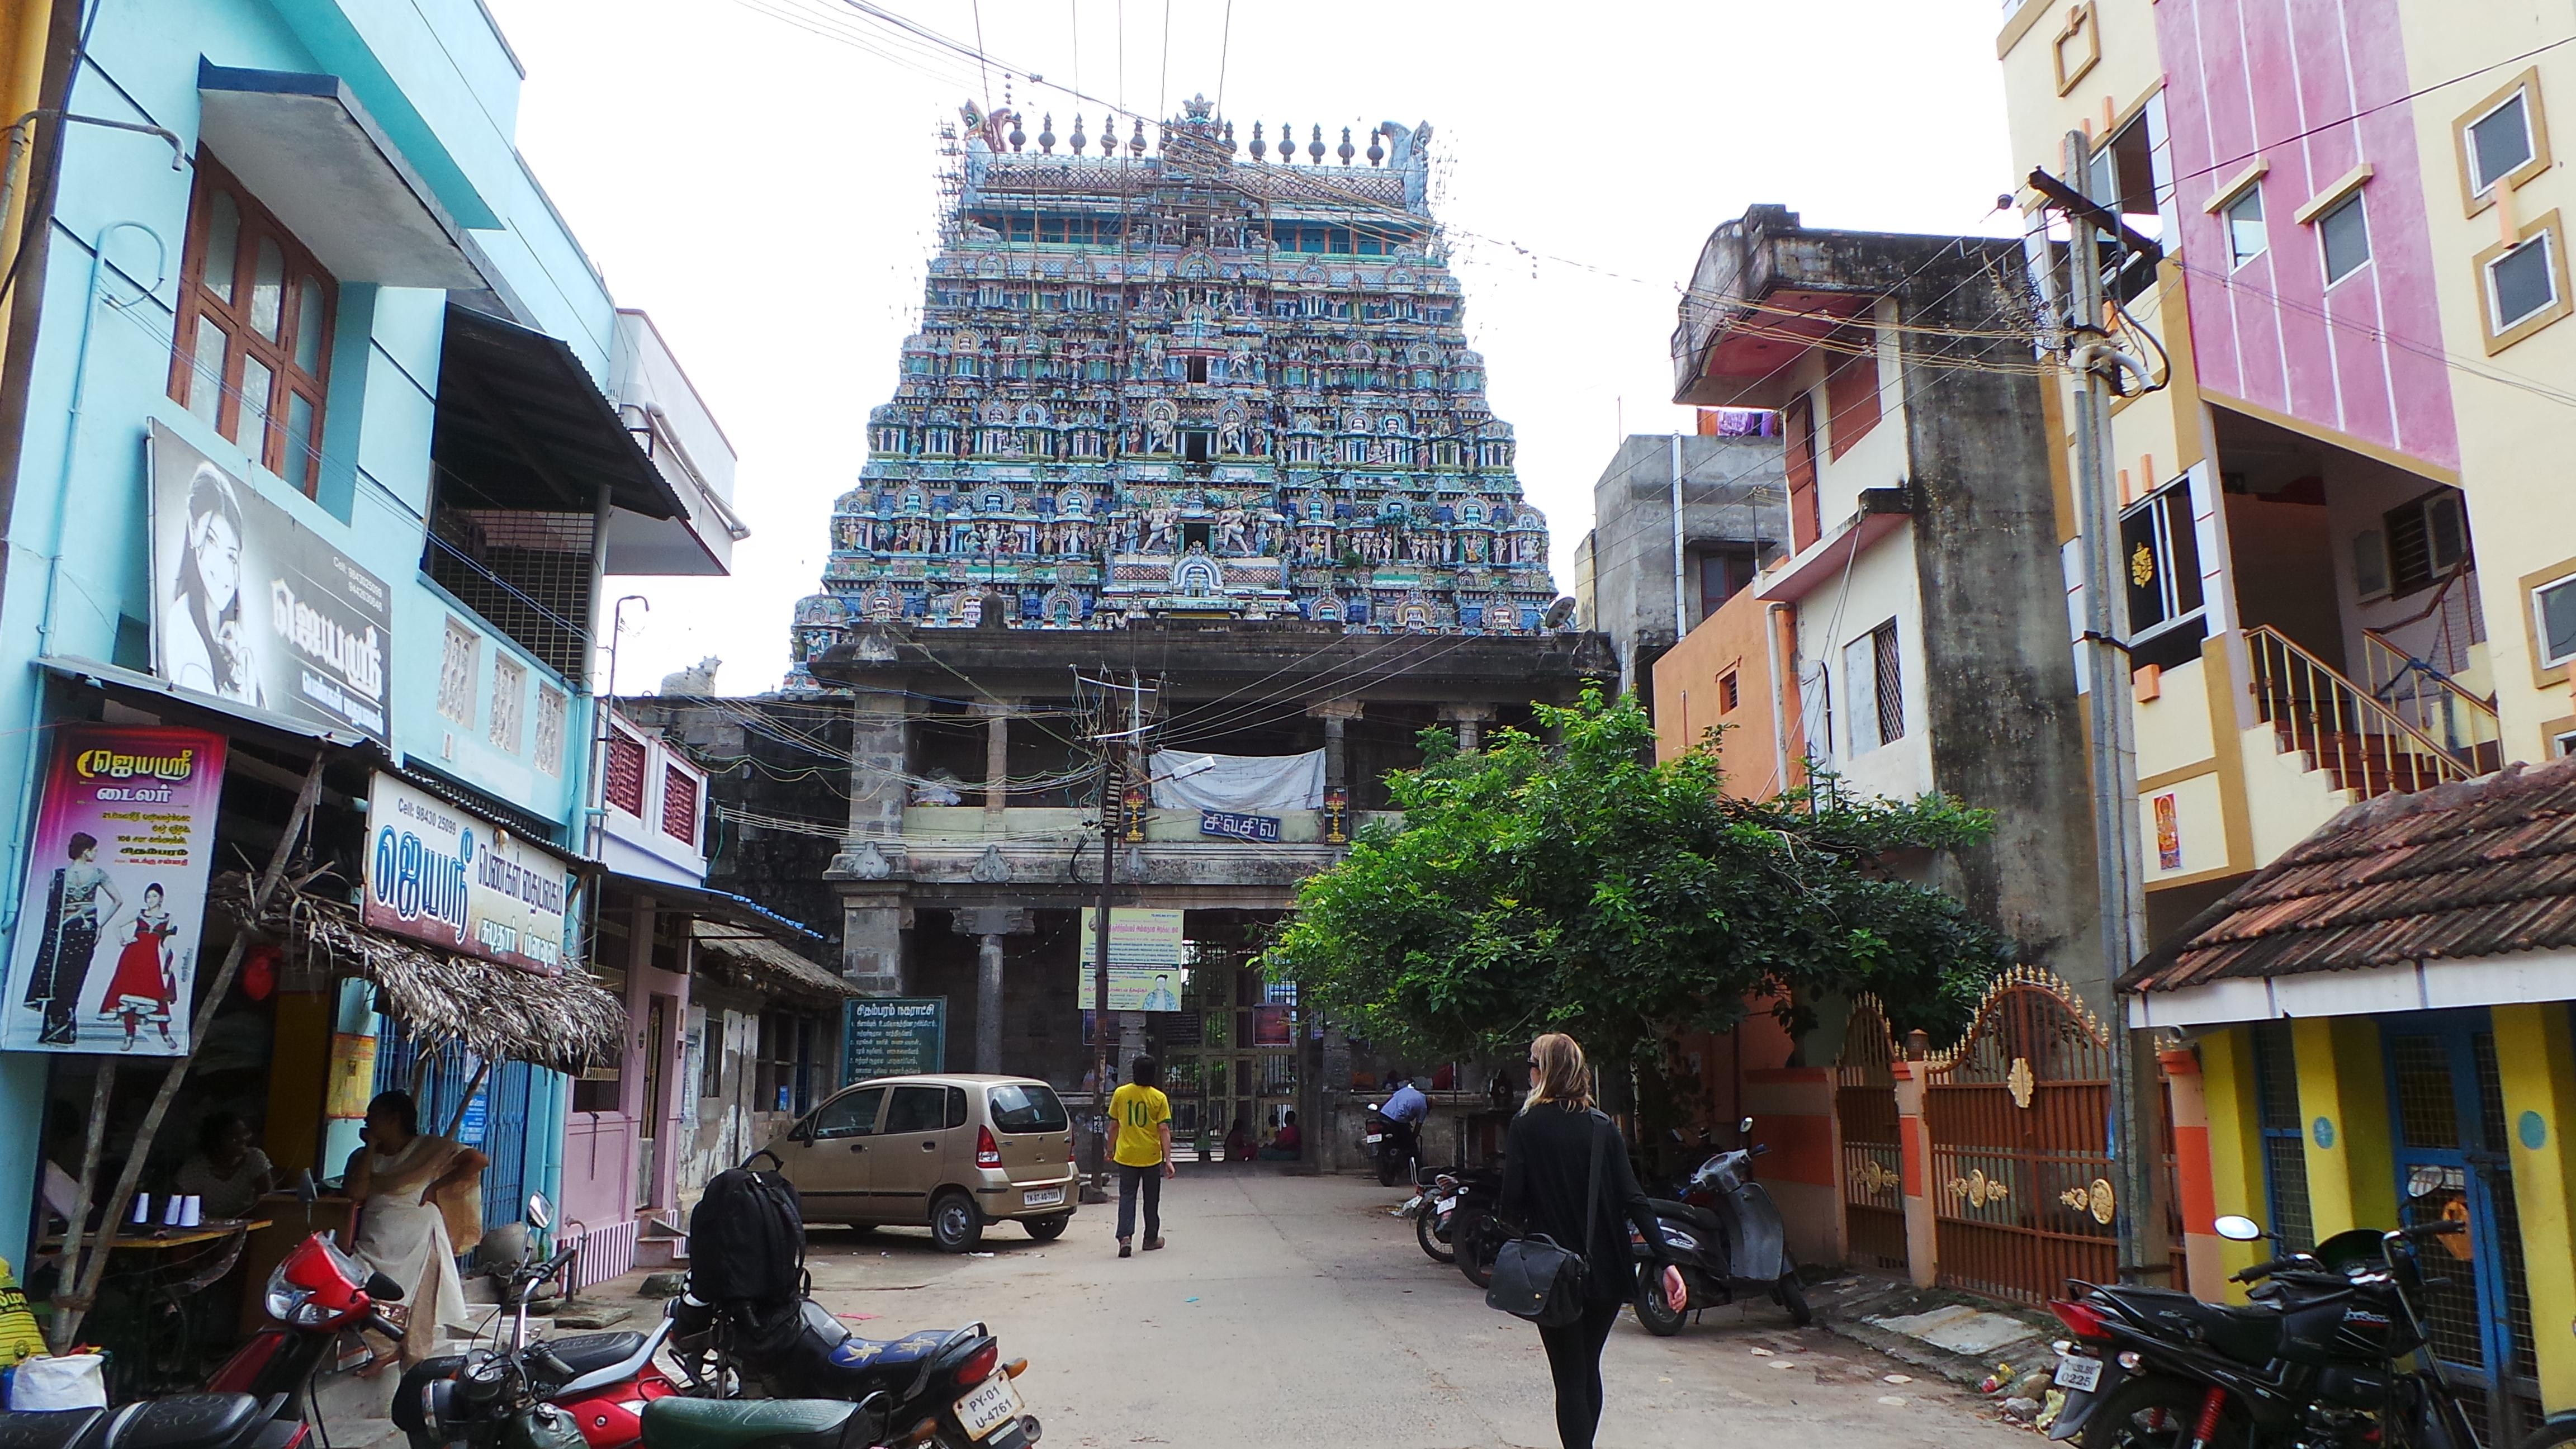 Chidambaram - The Temple of the Dancing God